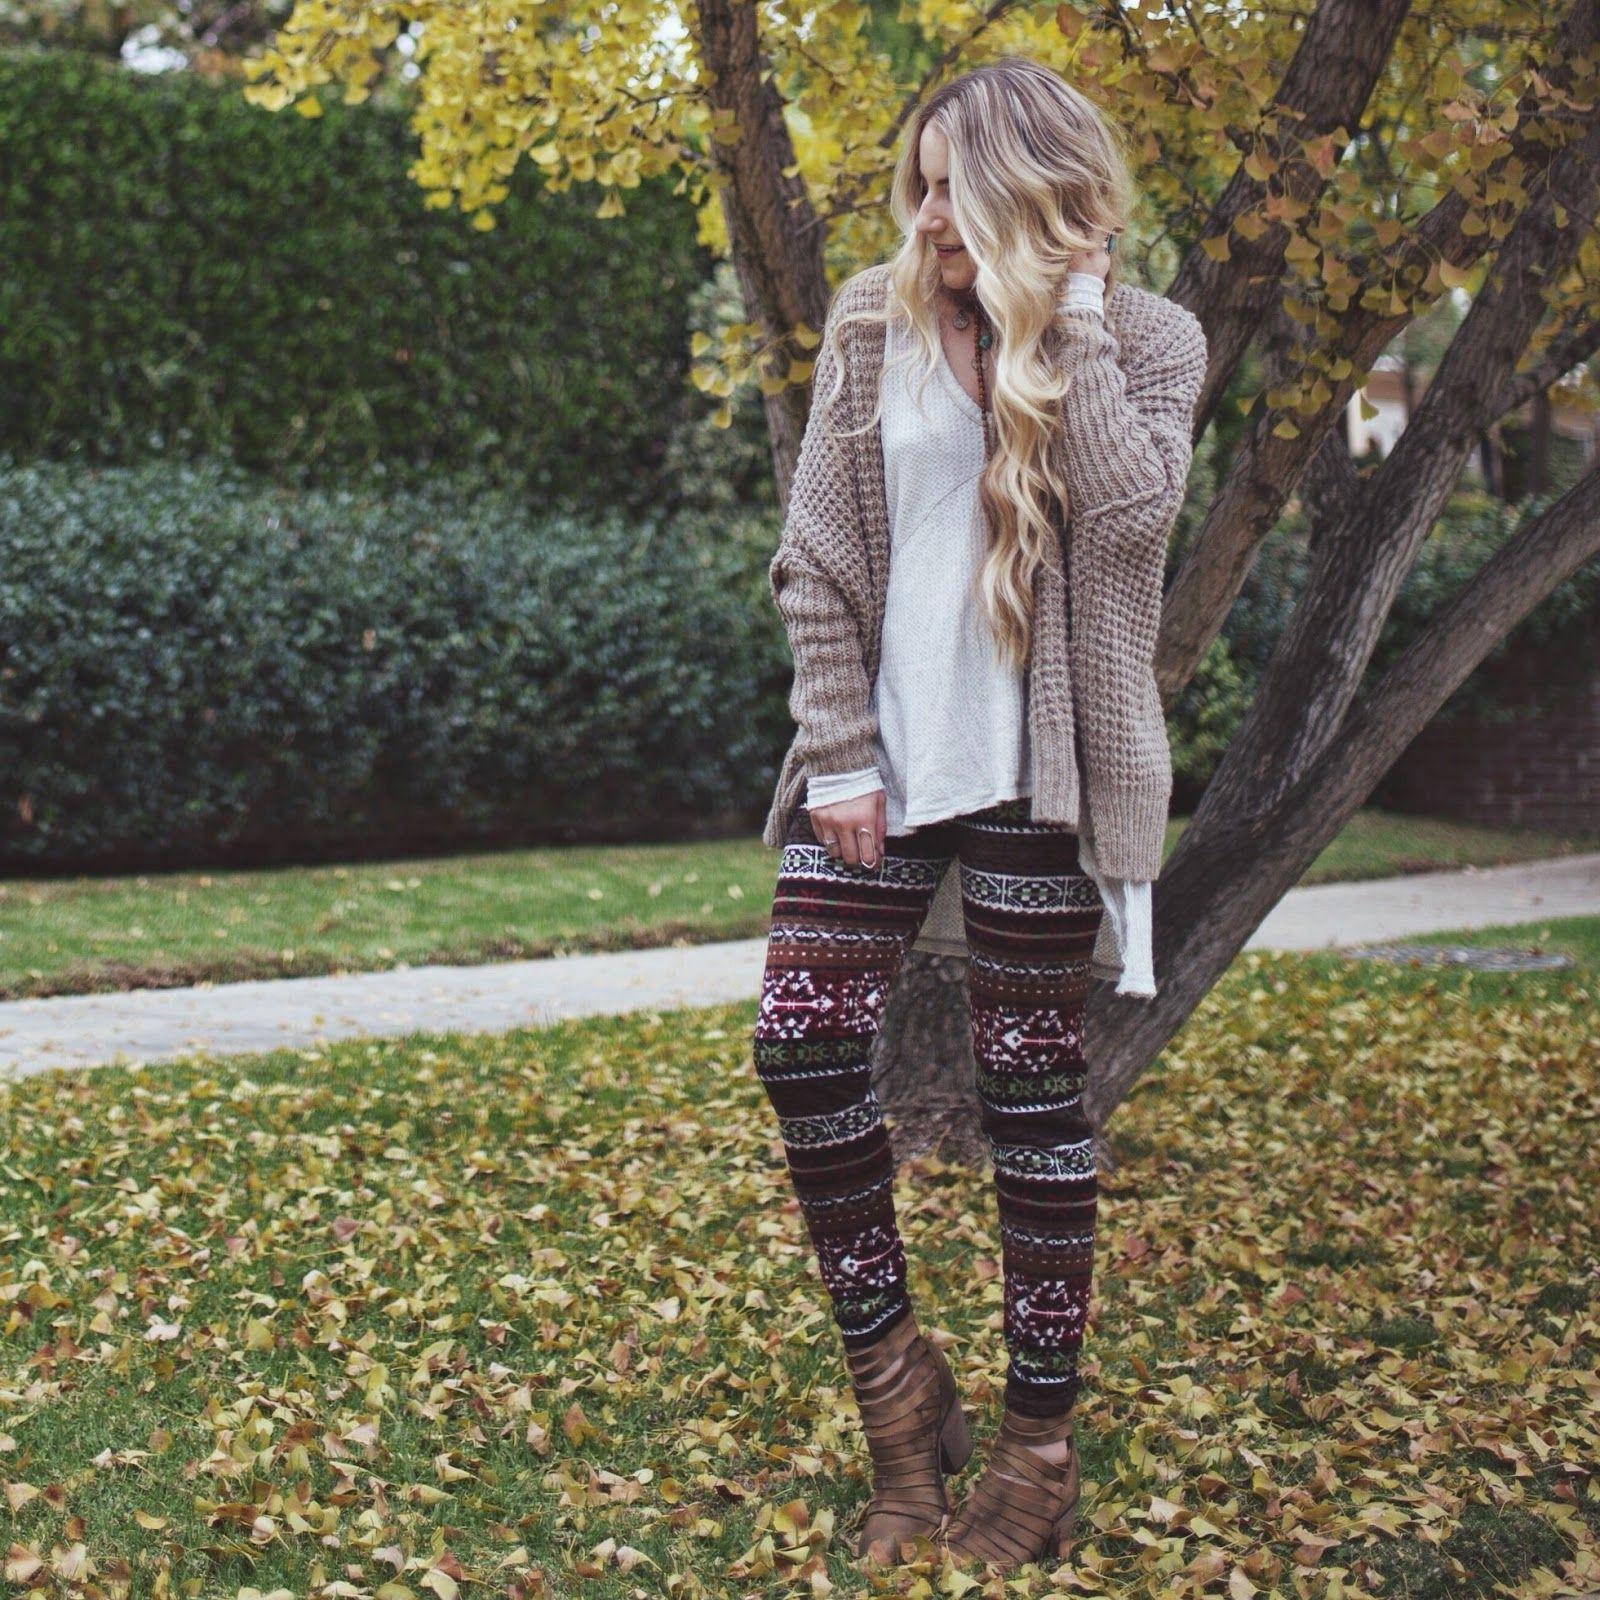 Pin by Joanne Hsueh on Street Style | Fashion, Winter fashion, Autumn winter fashion